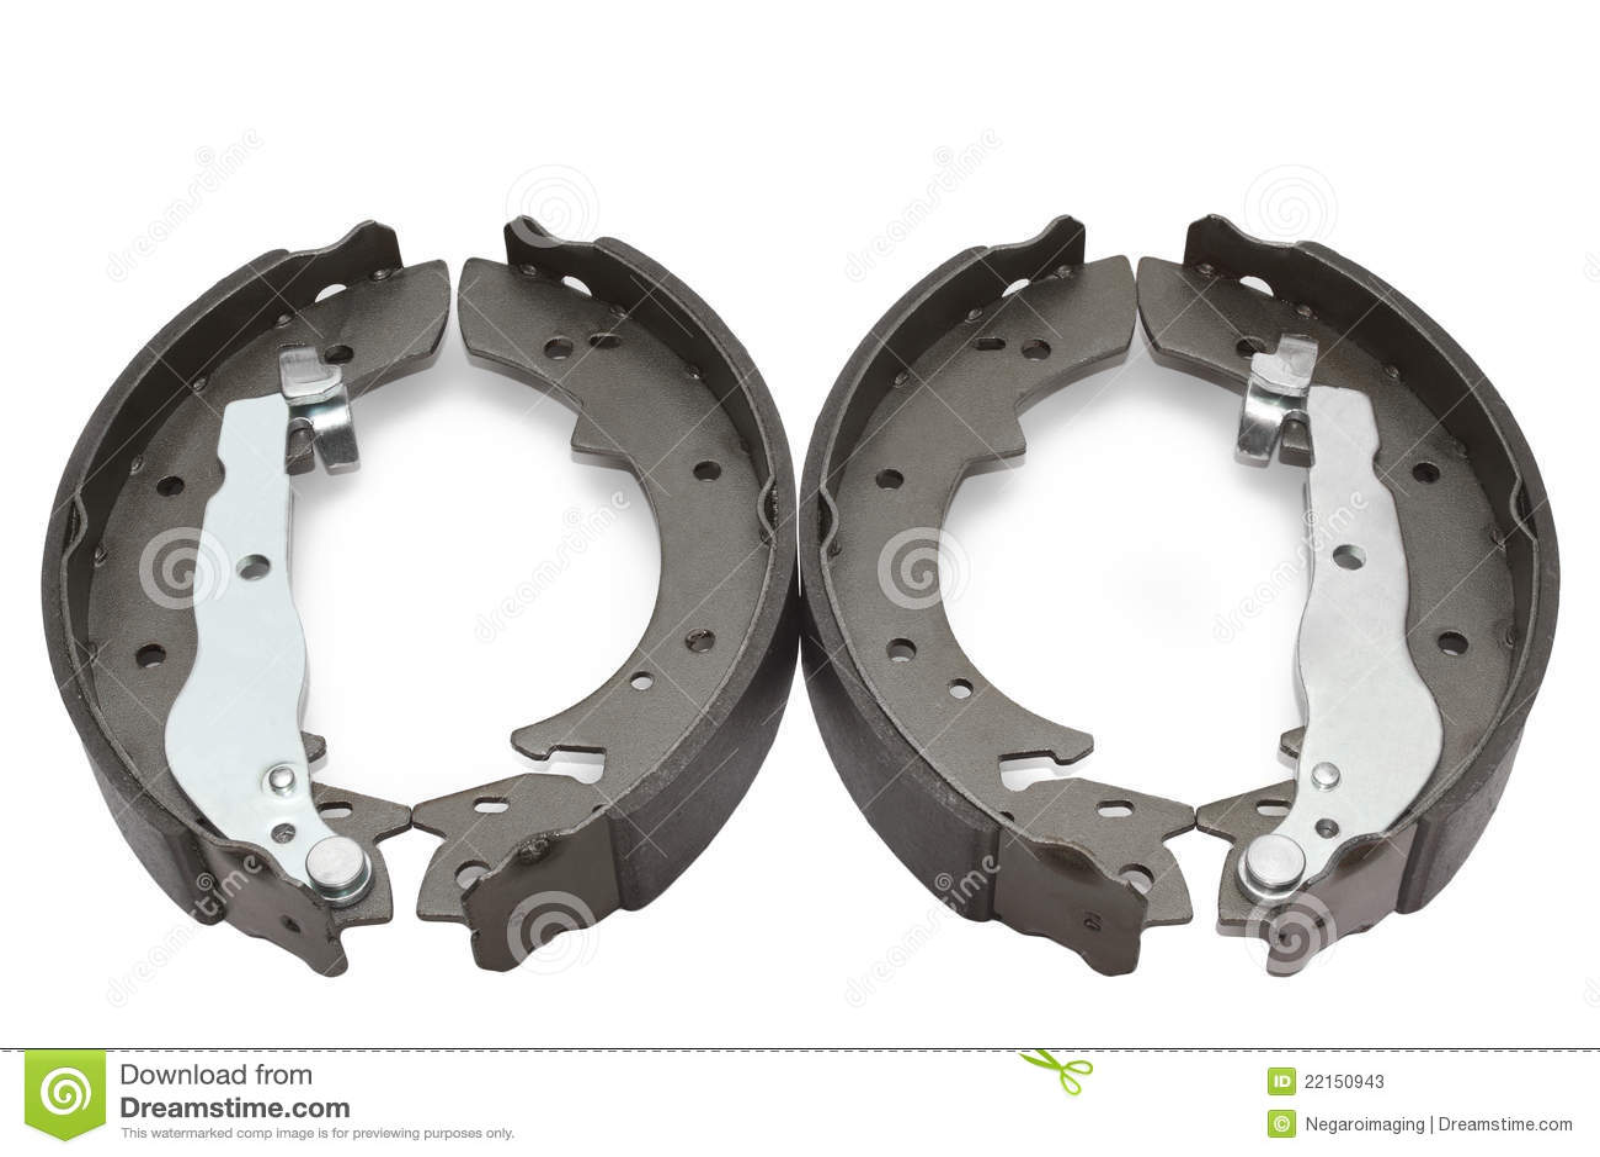 Brake Shoe Web : Car brake shoes stock image of service